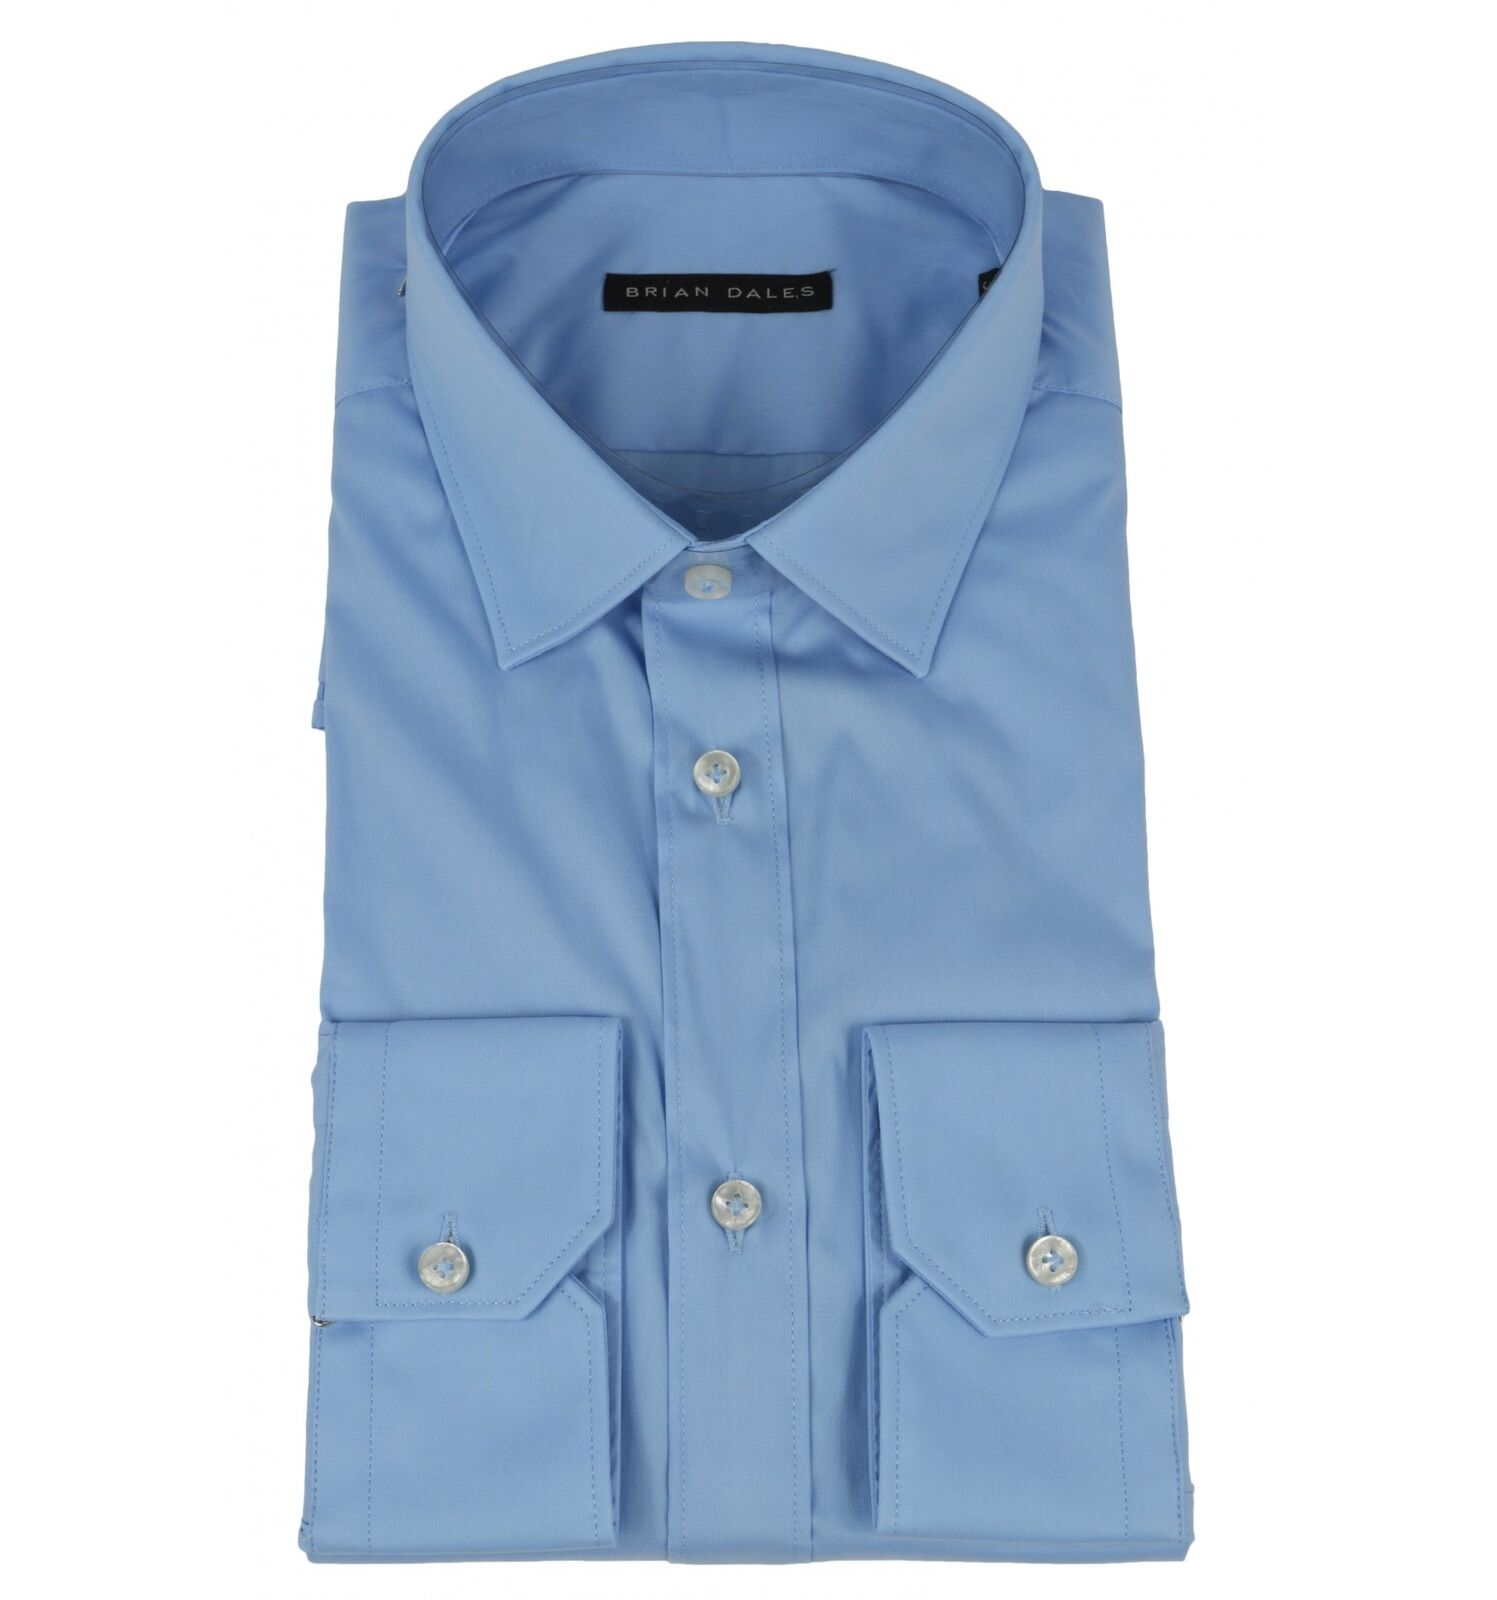 BRIAN DALES uomo camicia celeste slim fit ST6000